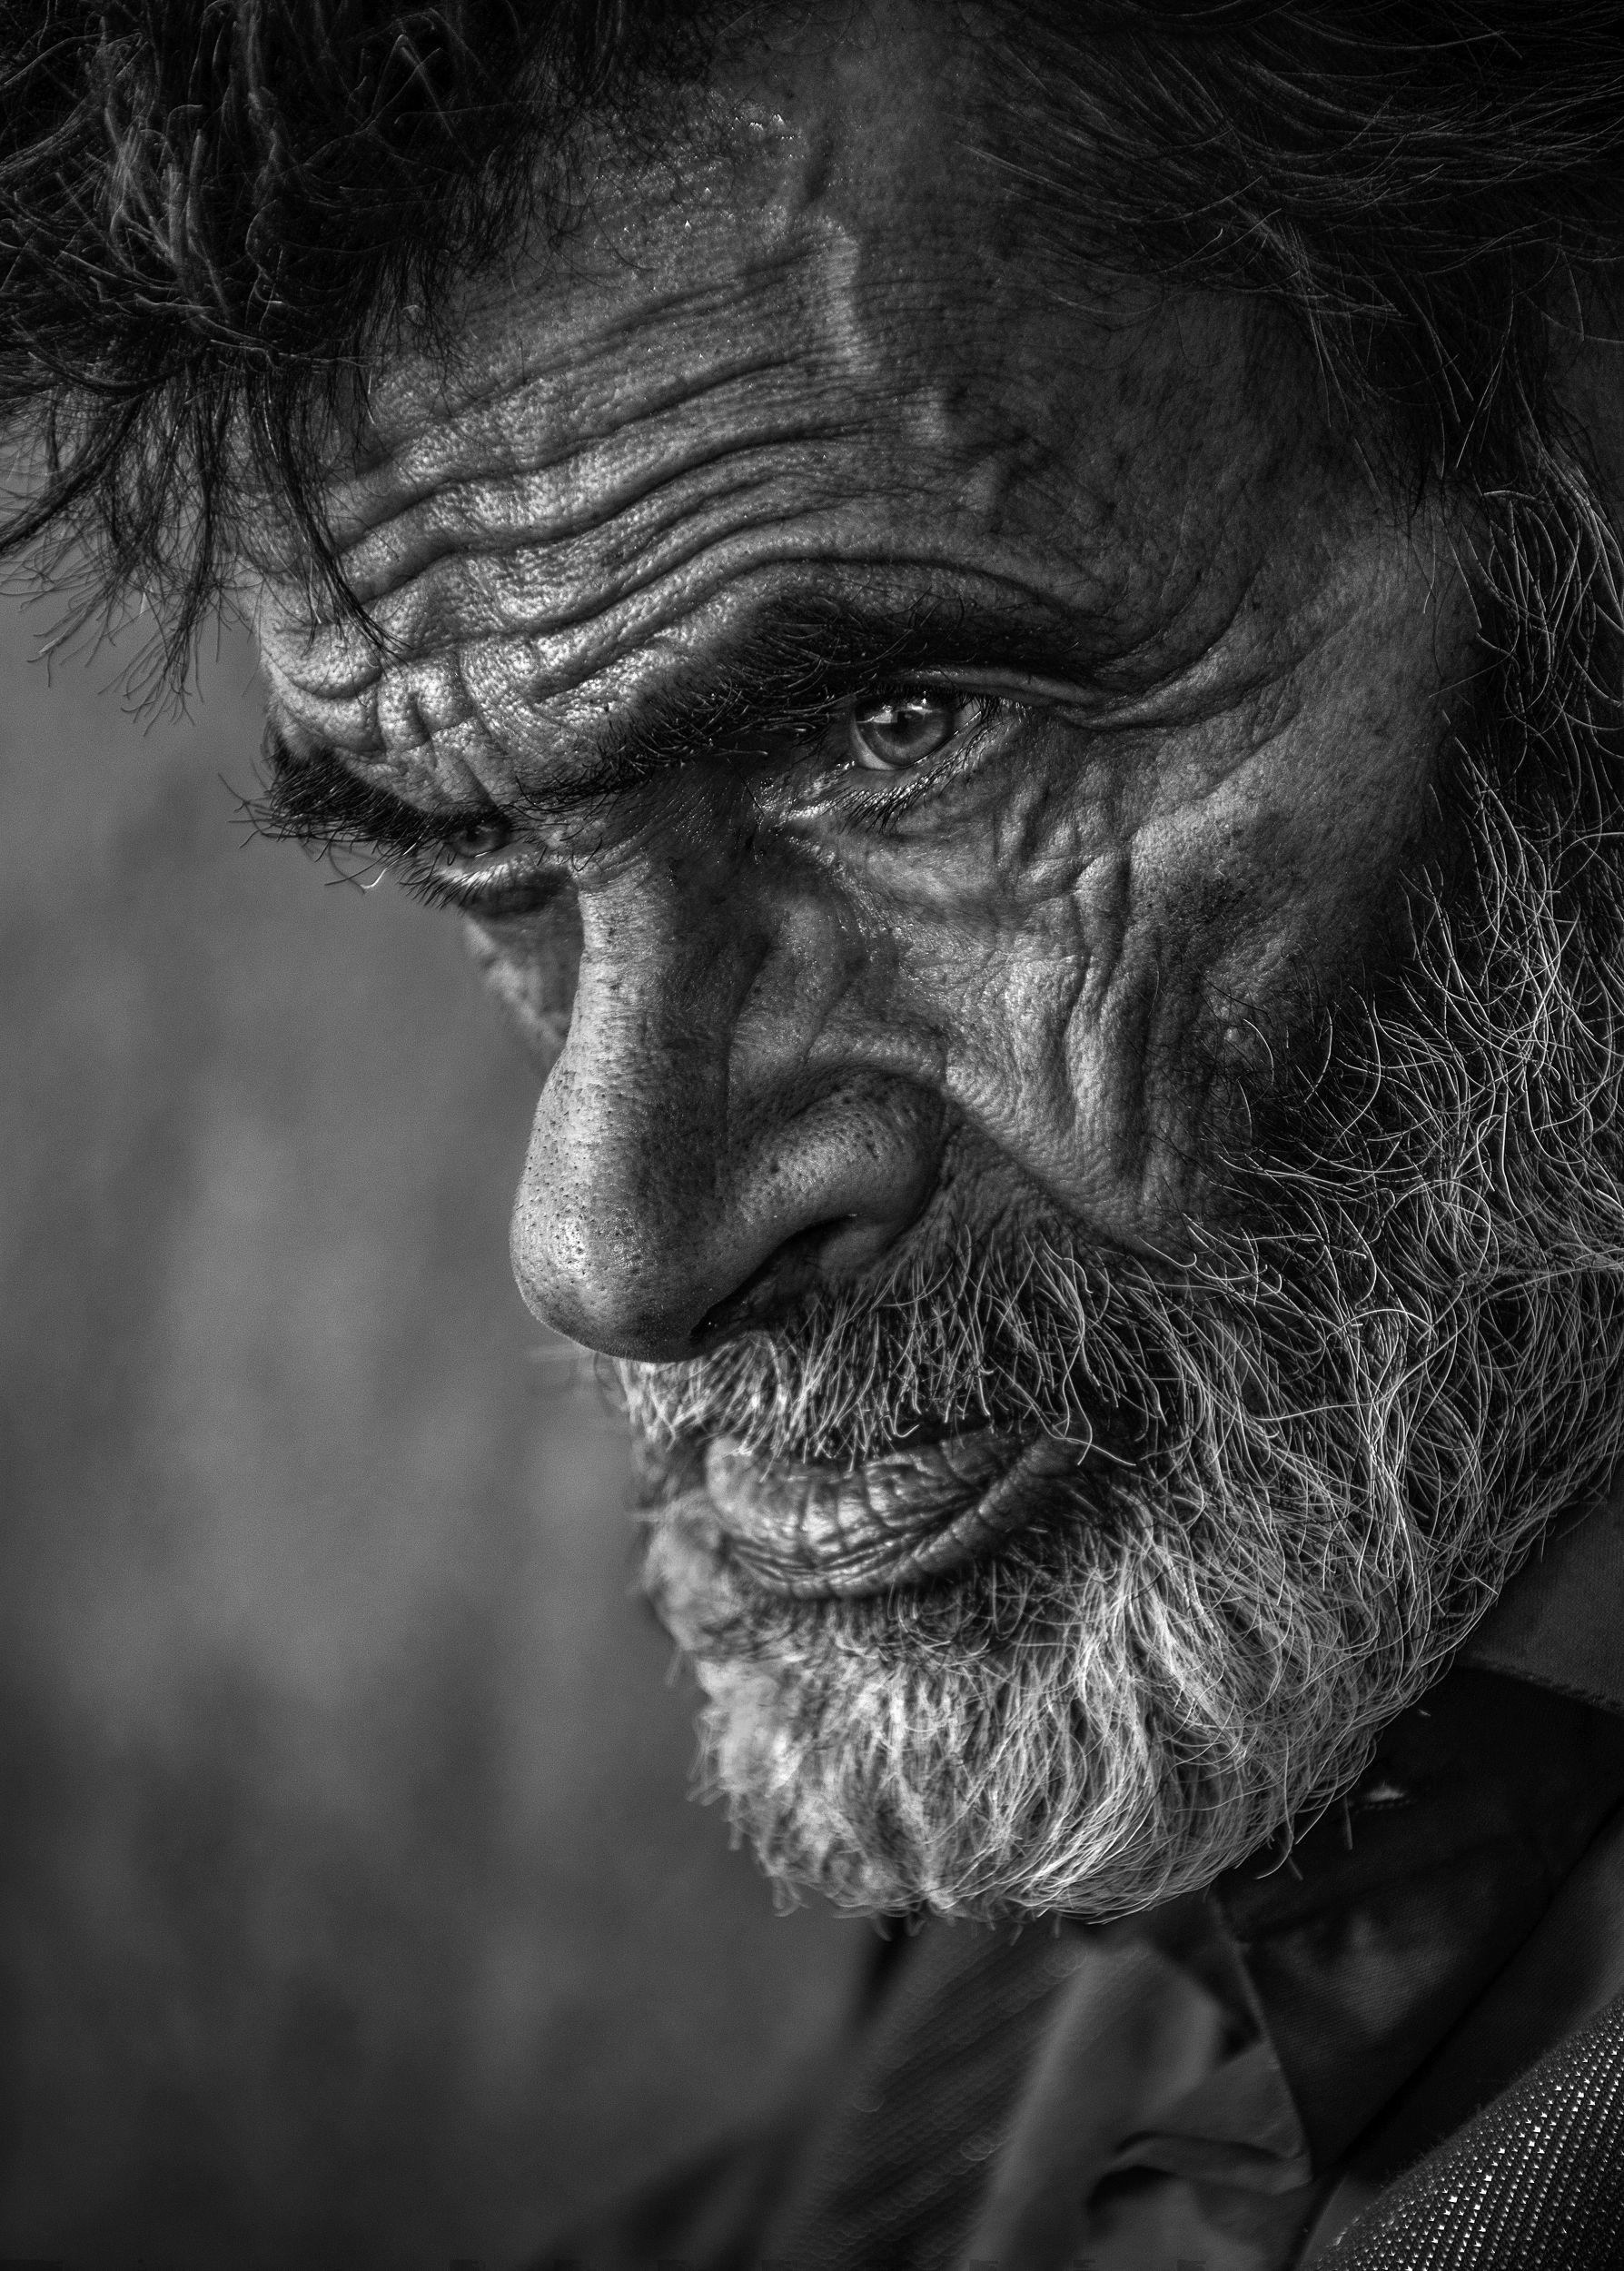 #portrait #close_up #people #skin #face #look, Zavvar Mehdi